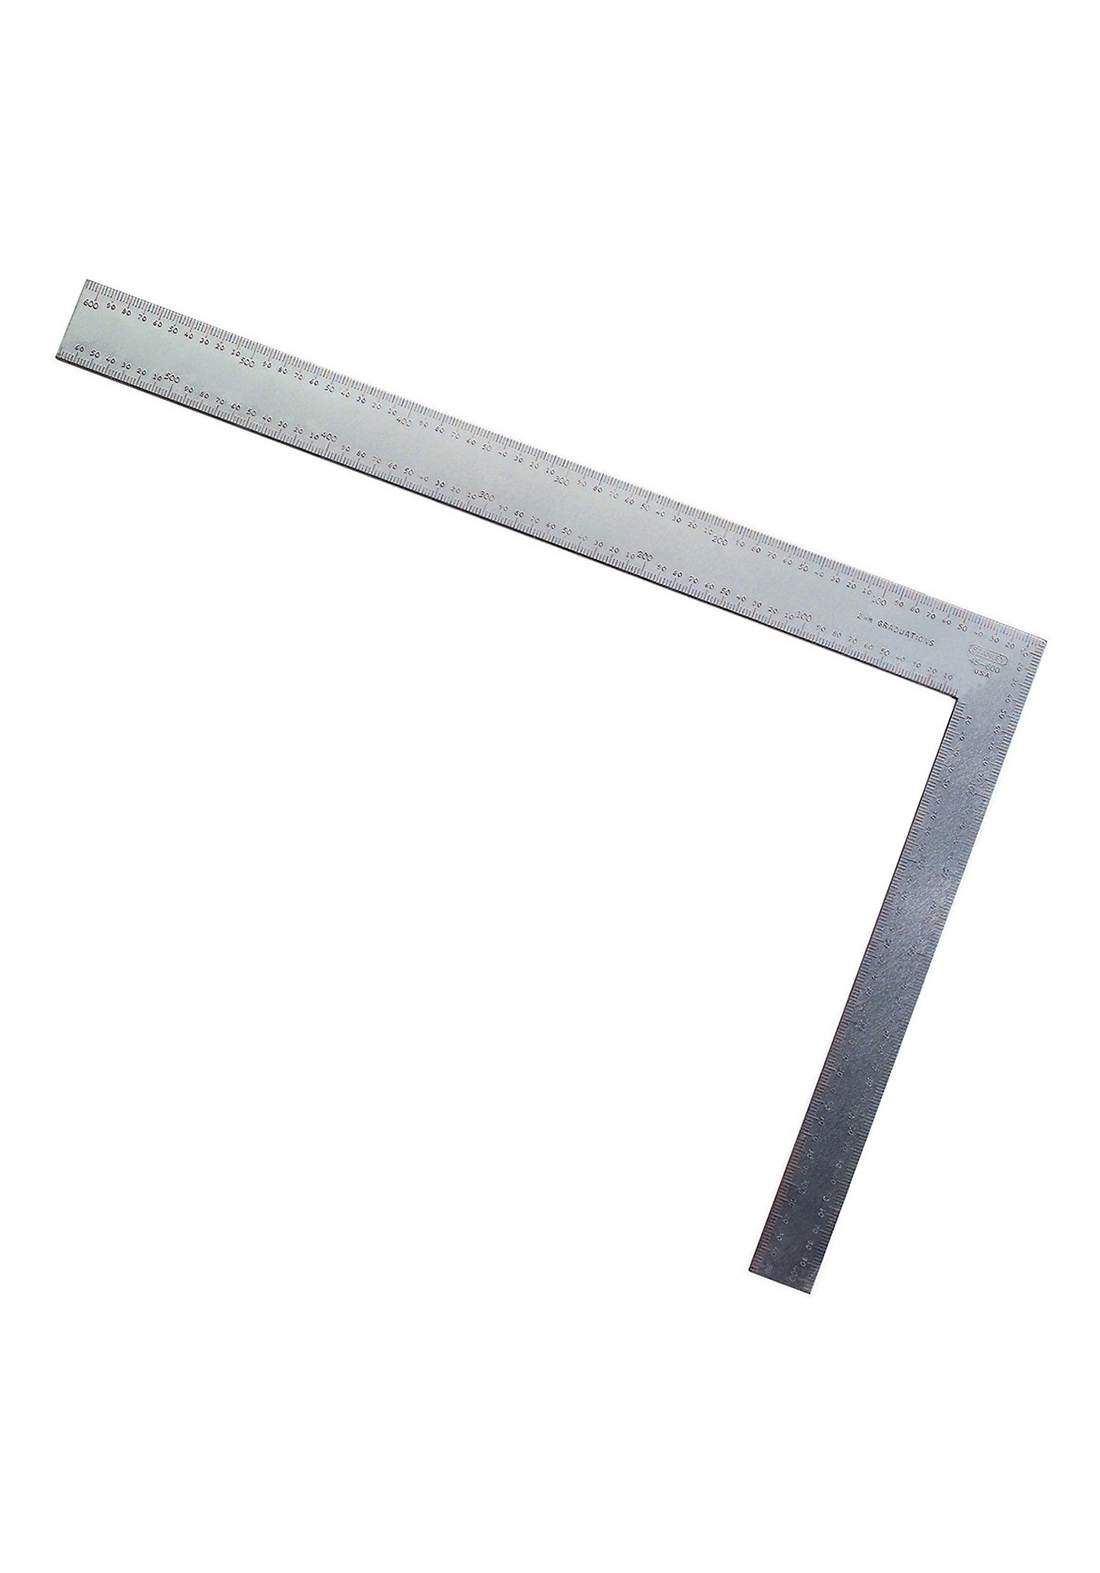 Stanley 45-600 Steel Square Aluminum Handle 400mm كونيه